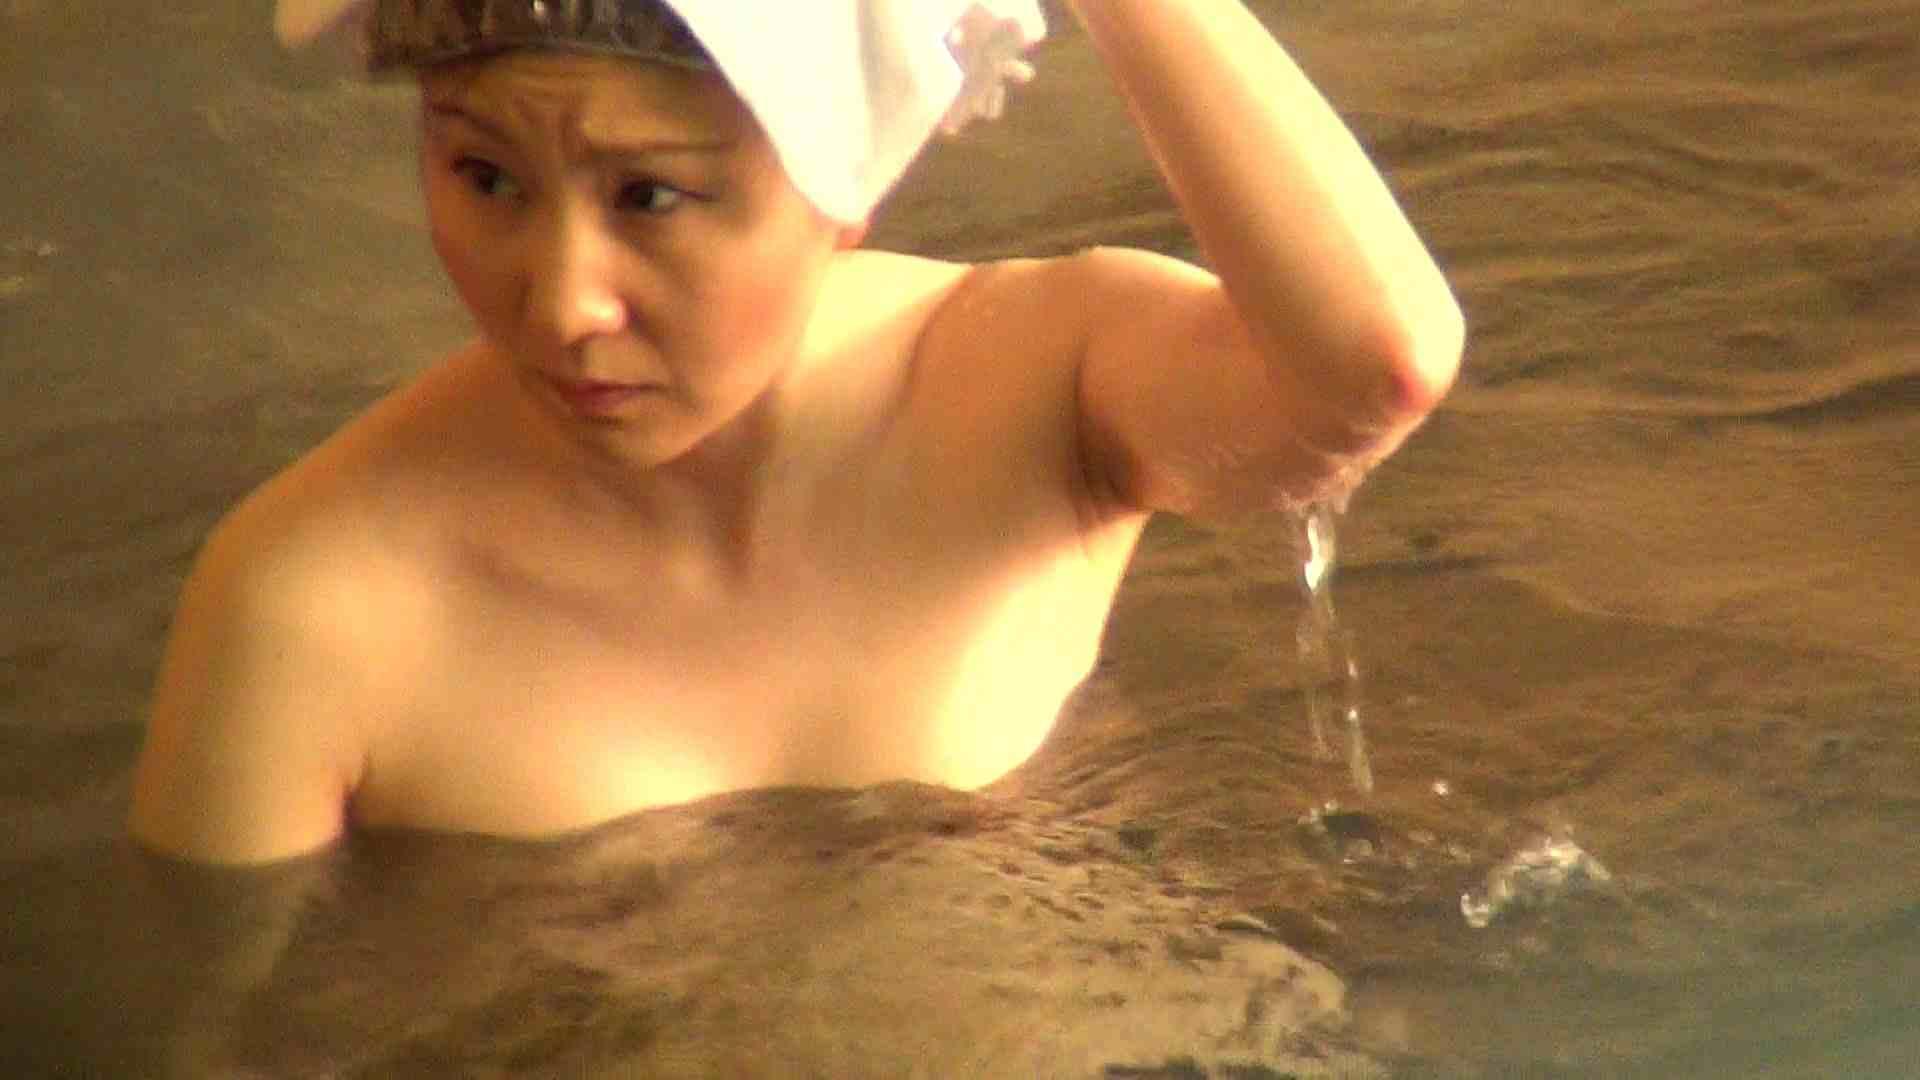 Vol.48 眉間にしわをよせた美人さん 裸体 オメコ動画キャプチャ 101連発 34